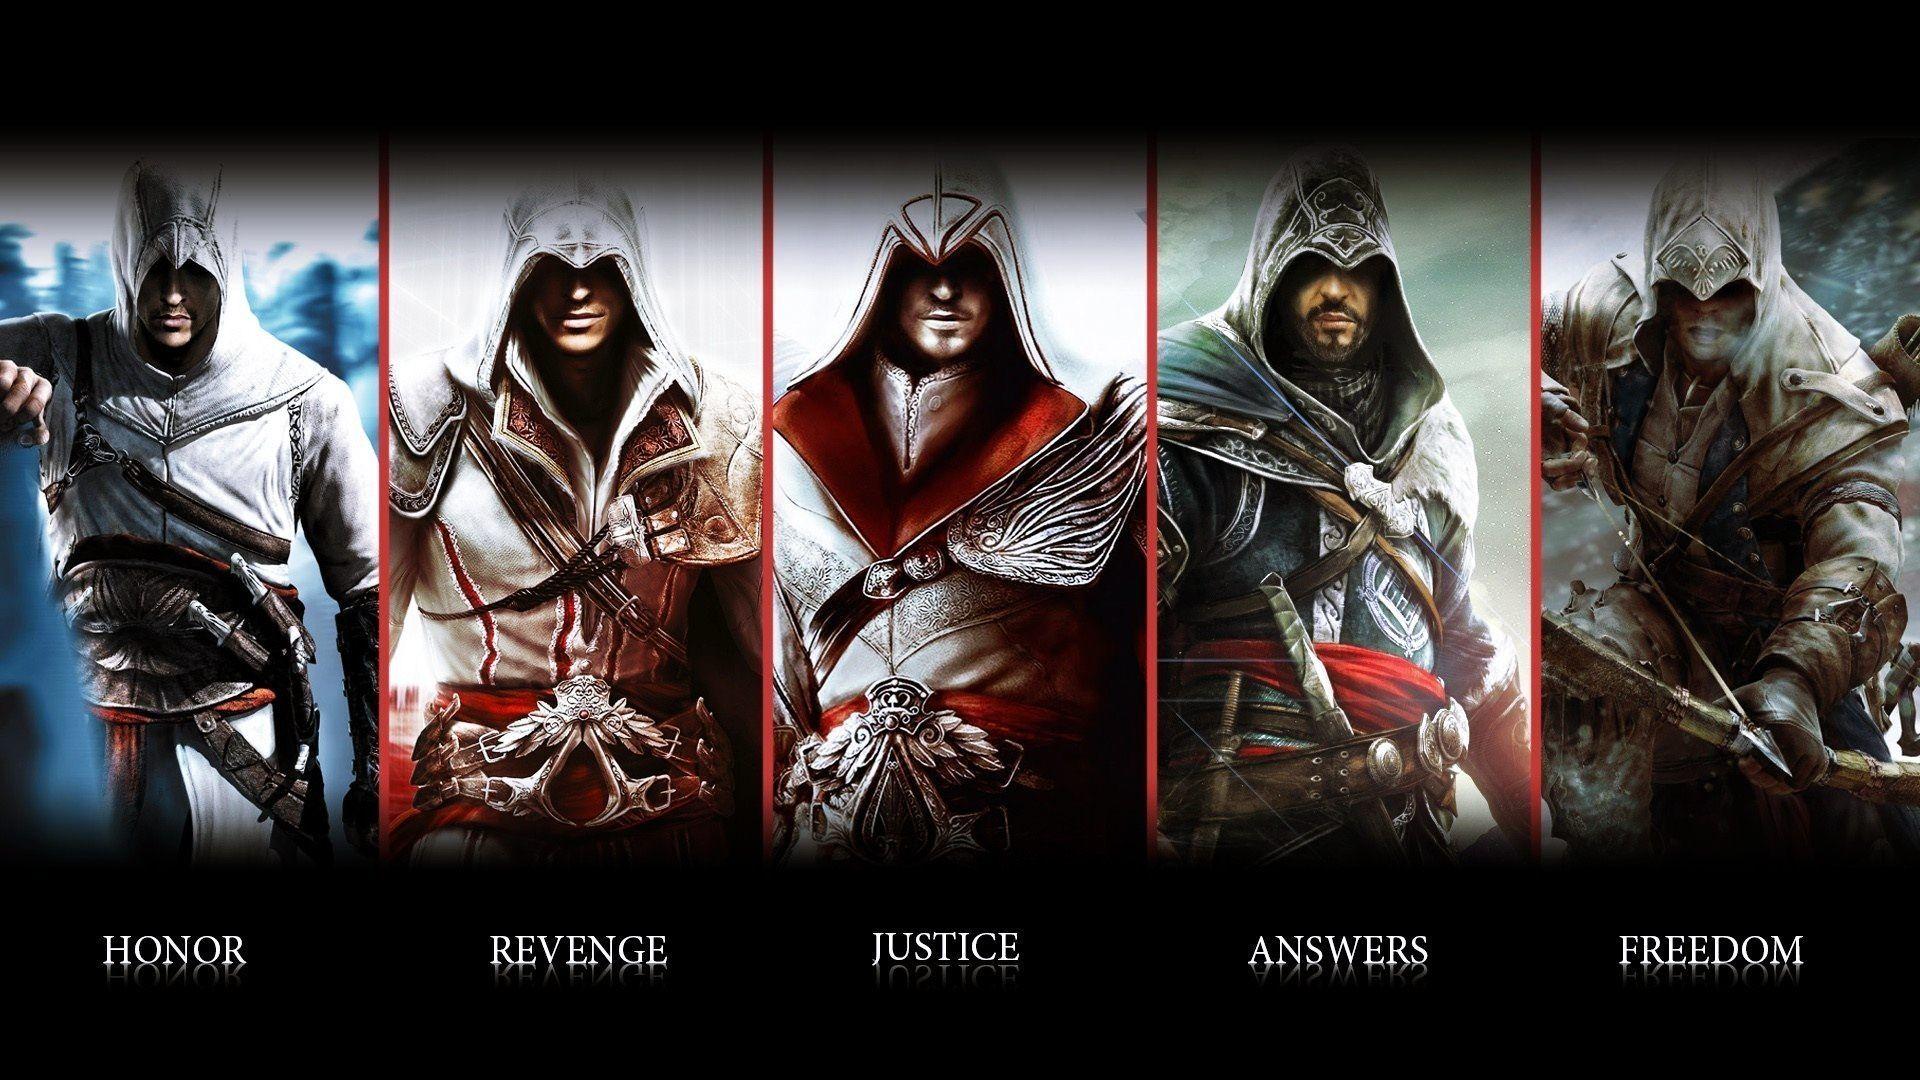 Assassins Creed Unity Wallpaper Hd Resolution Sdeerwallpaper